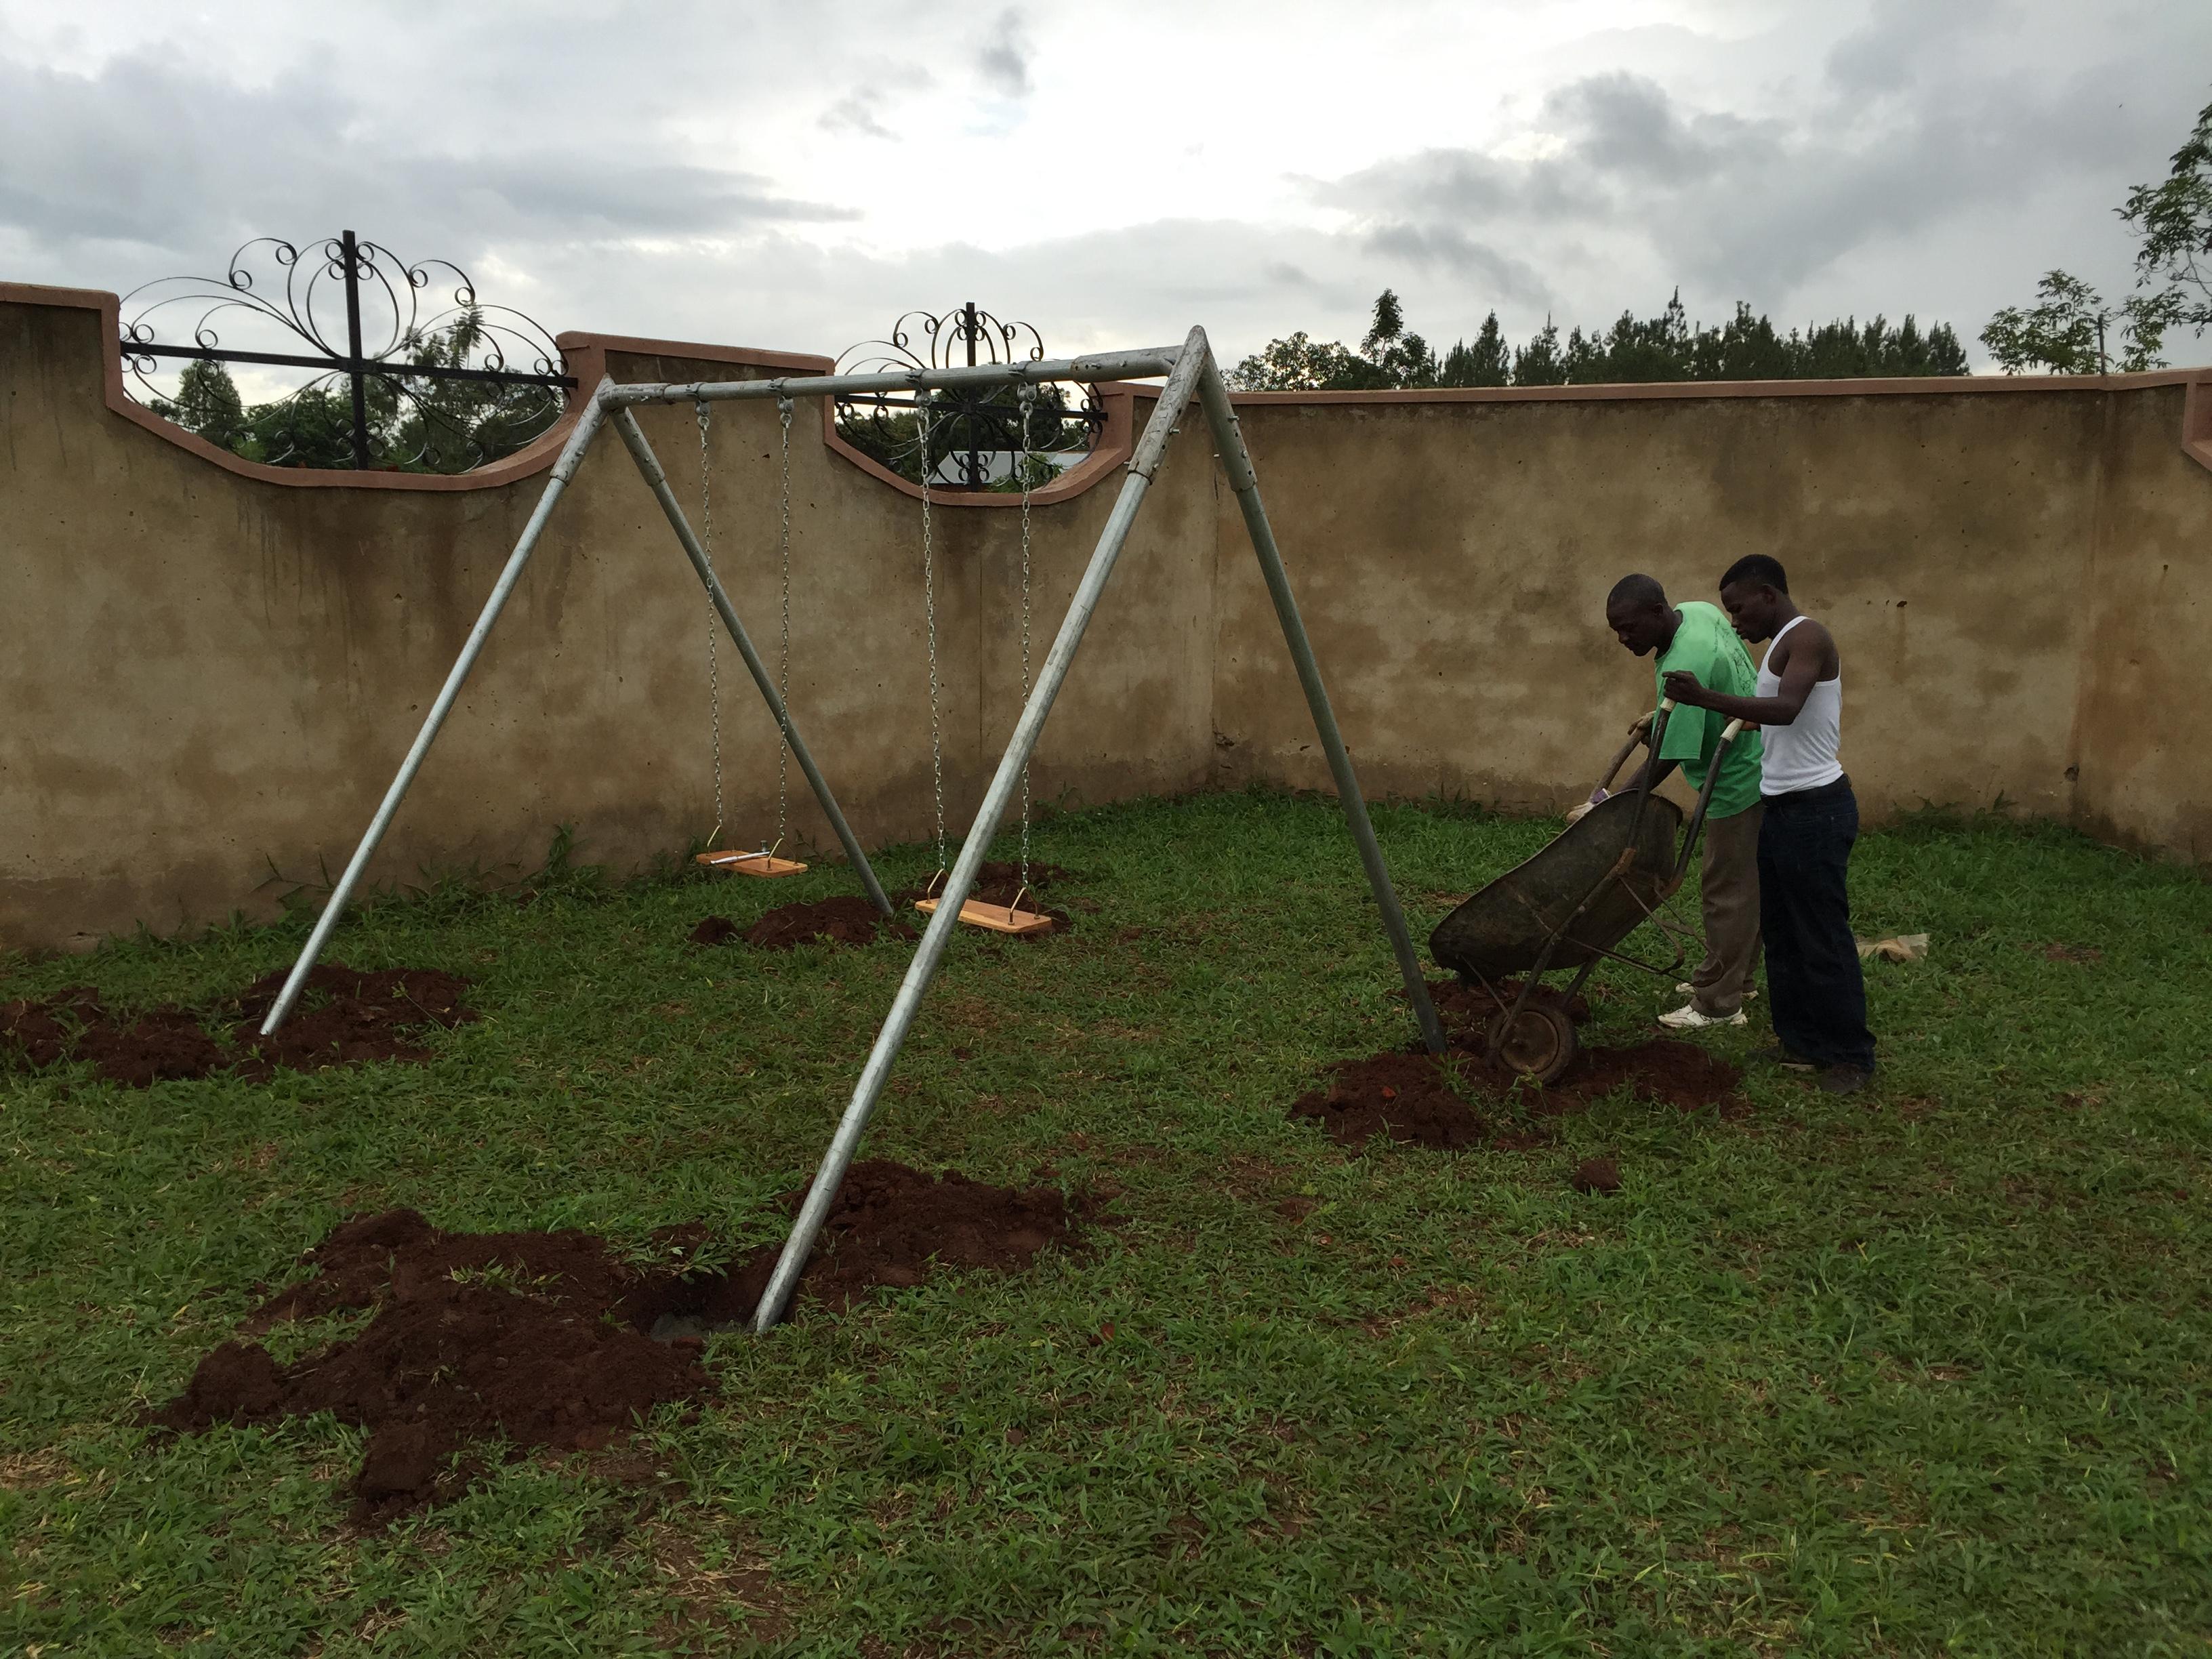 Installing Swing Sets In The Gulu Uganda Area Tired Road Warrior